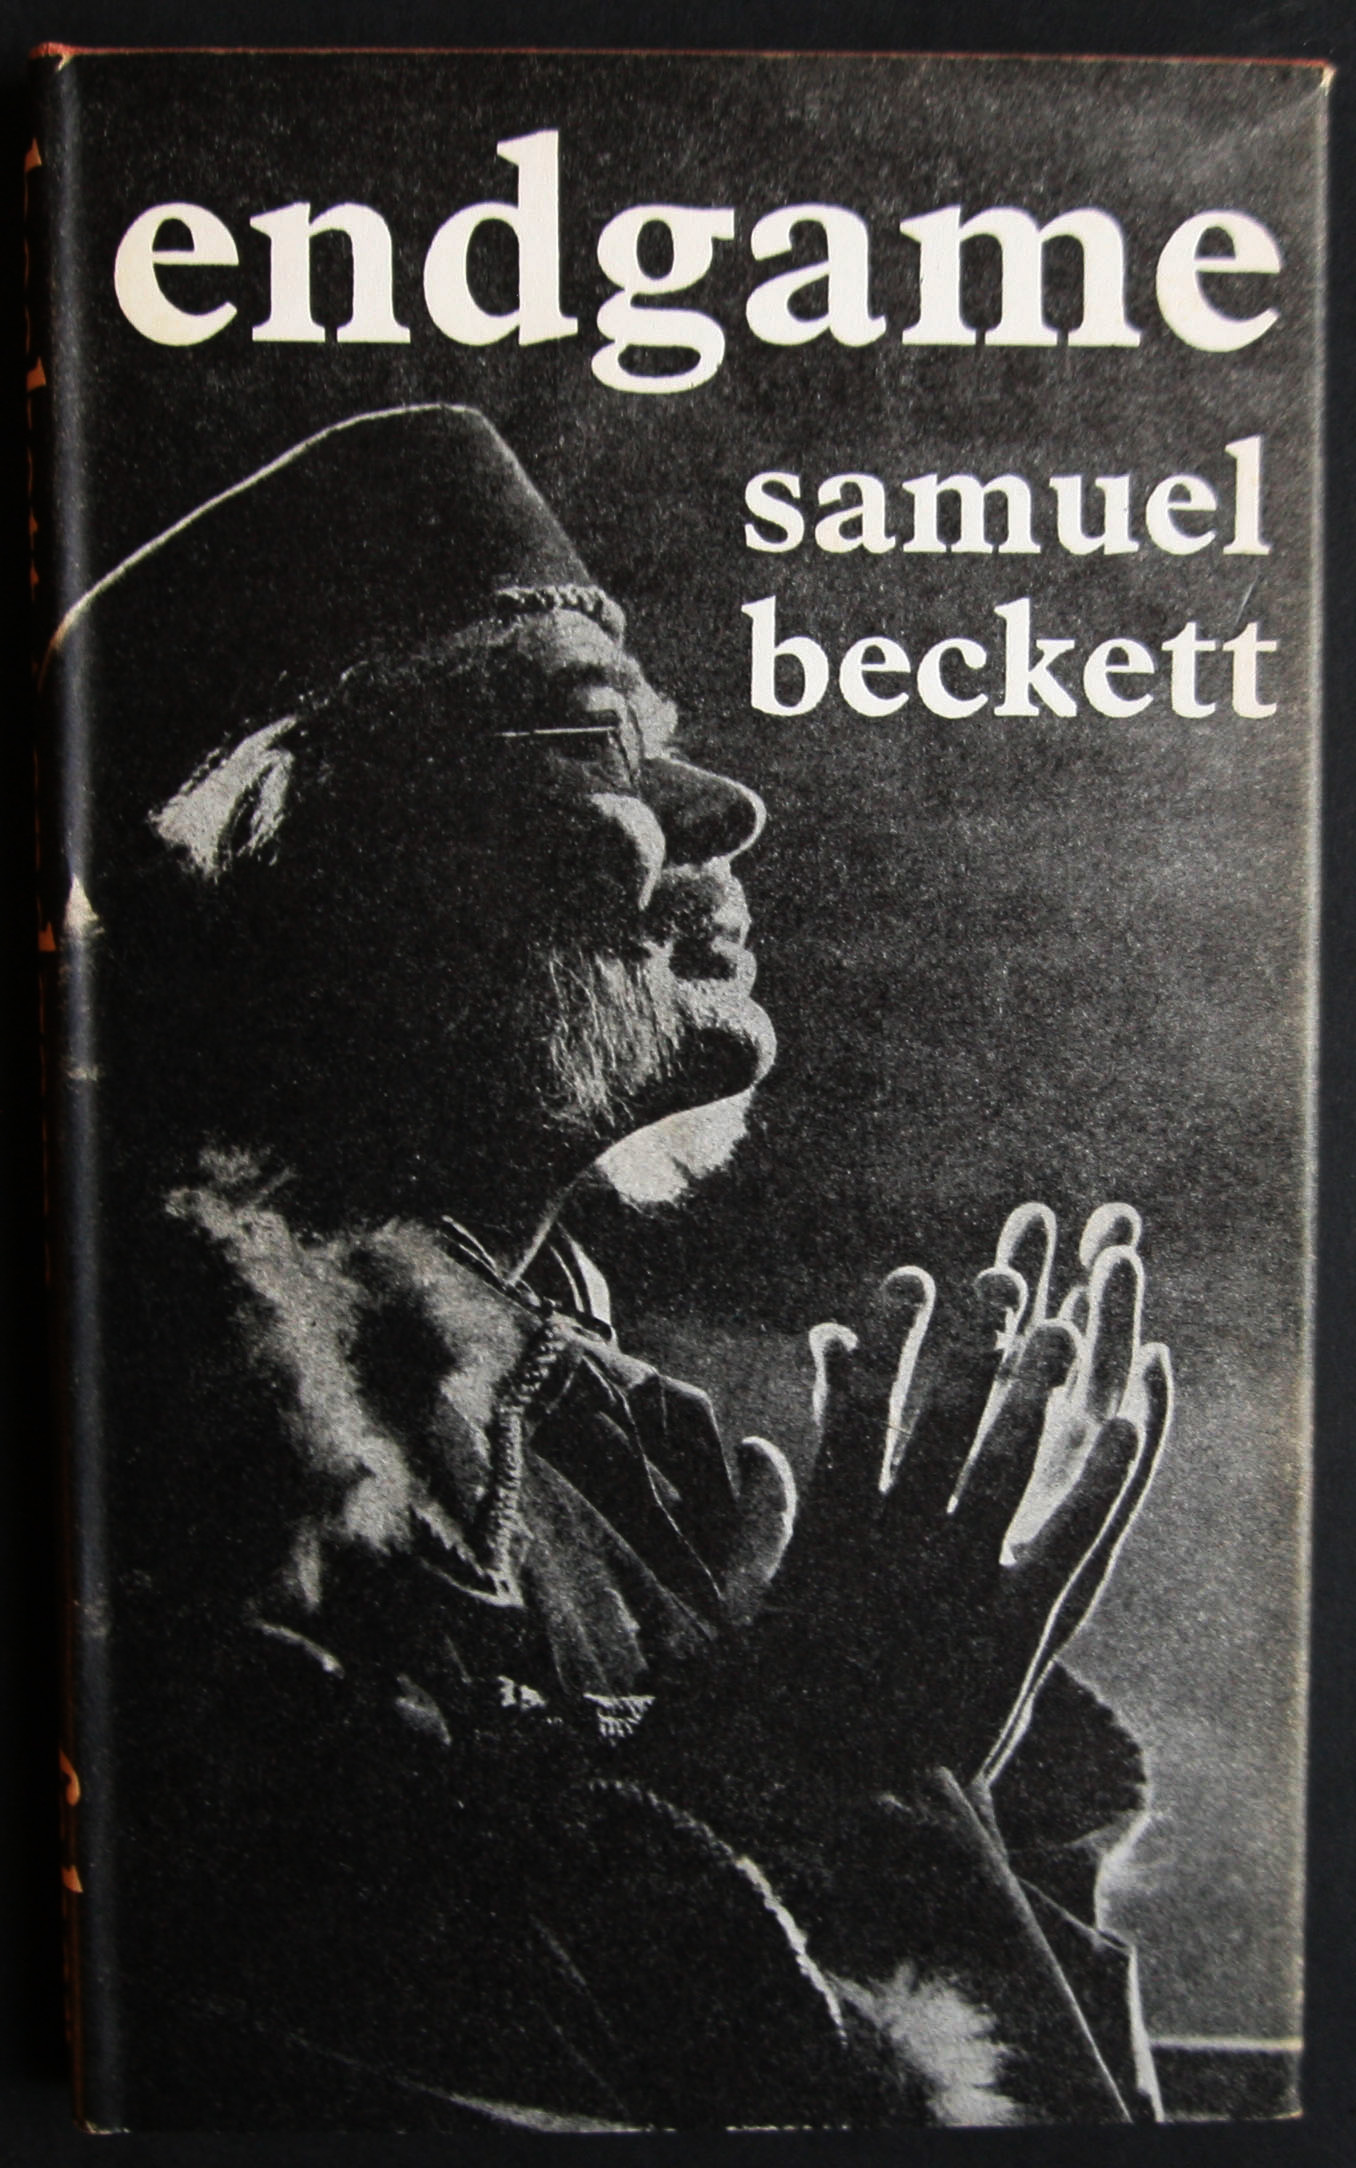 Samuel Beckett Endgame first edition